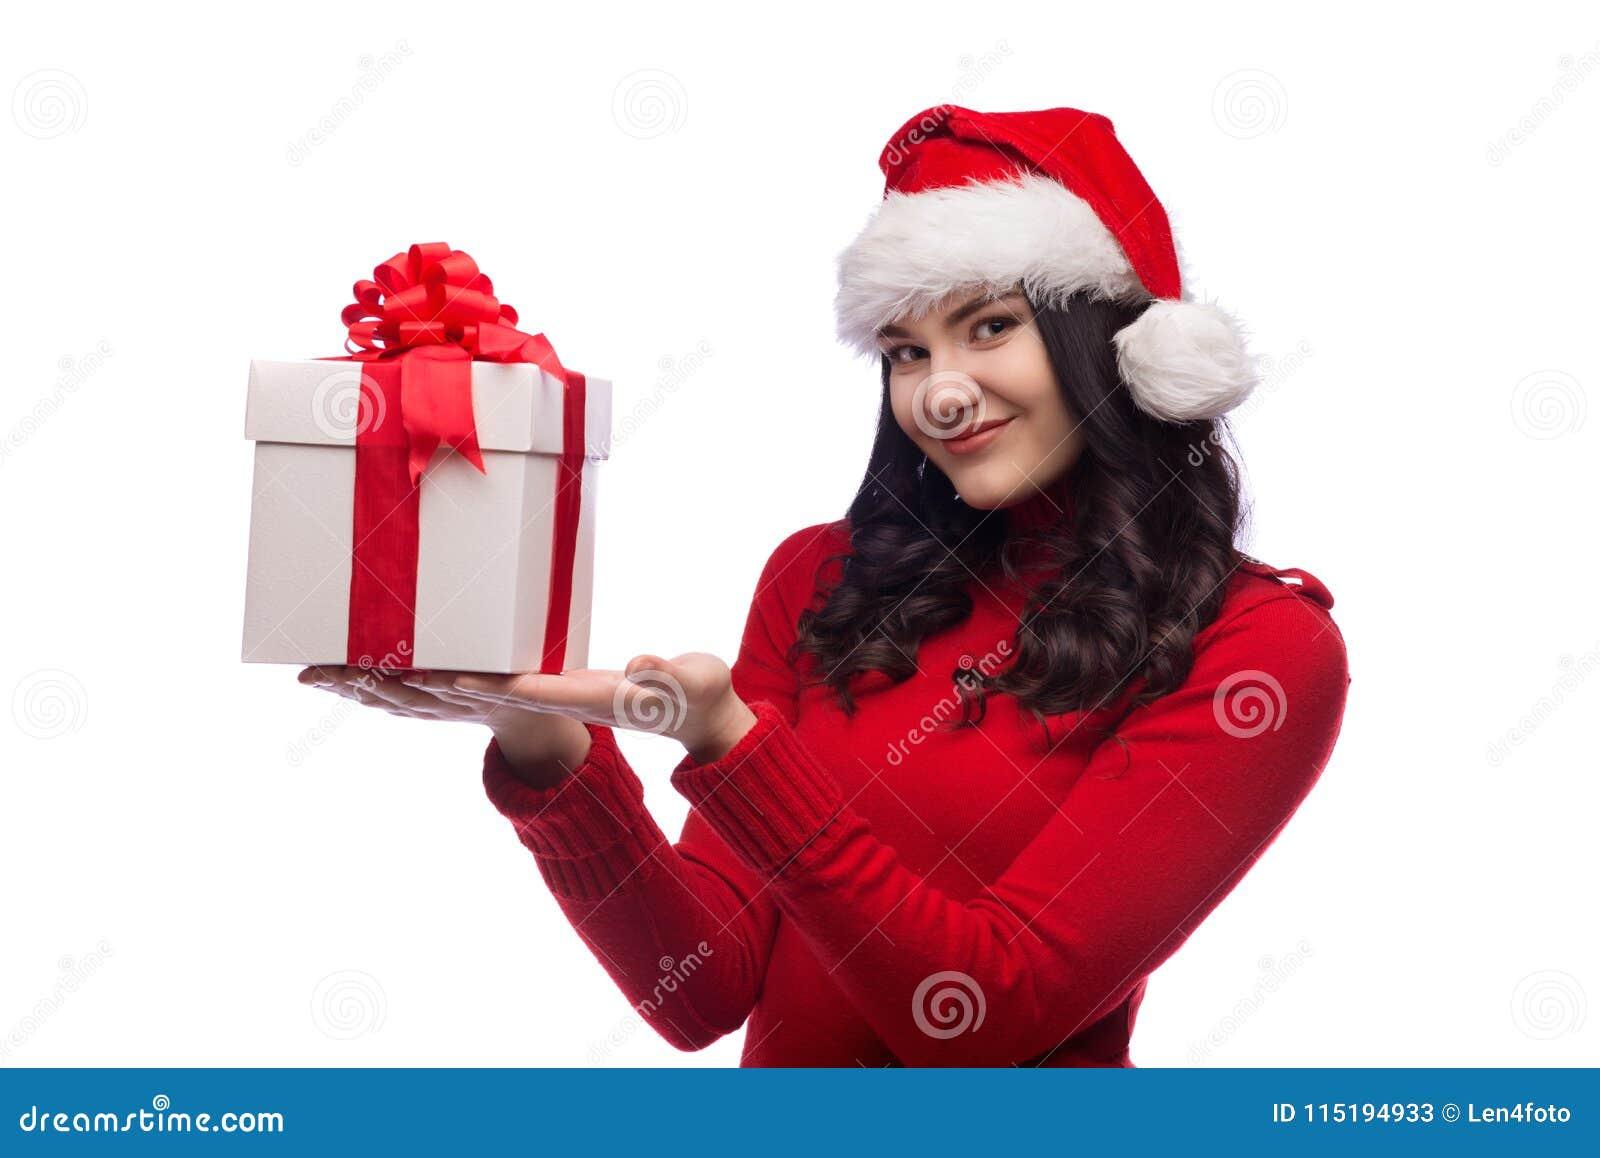 677644954fef9 Christmas Santa Hat Isolated Woman Hold Christmas Gift. Stock Image ...